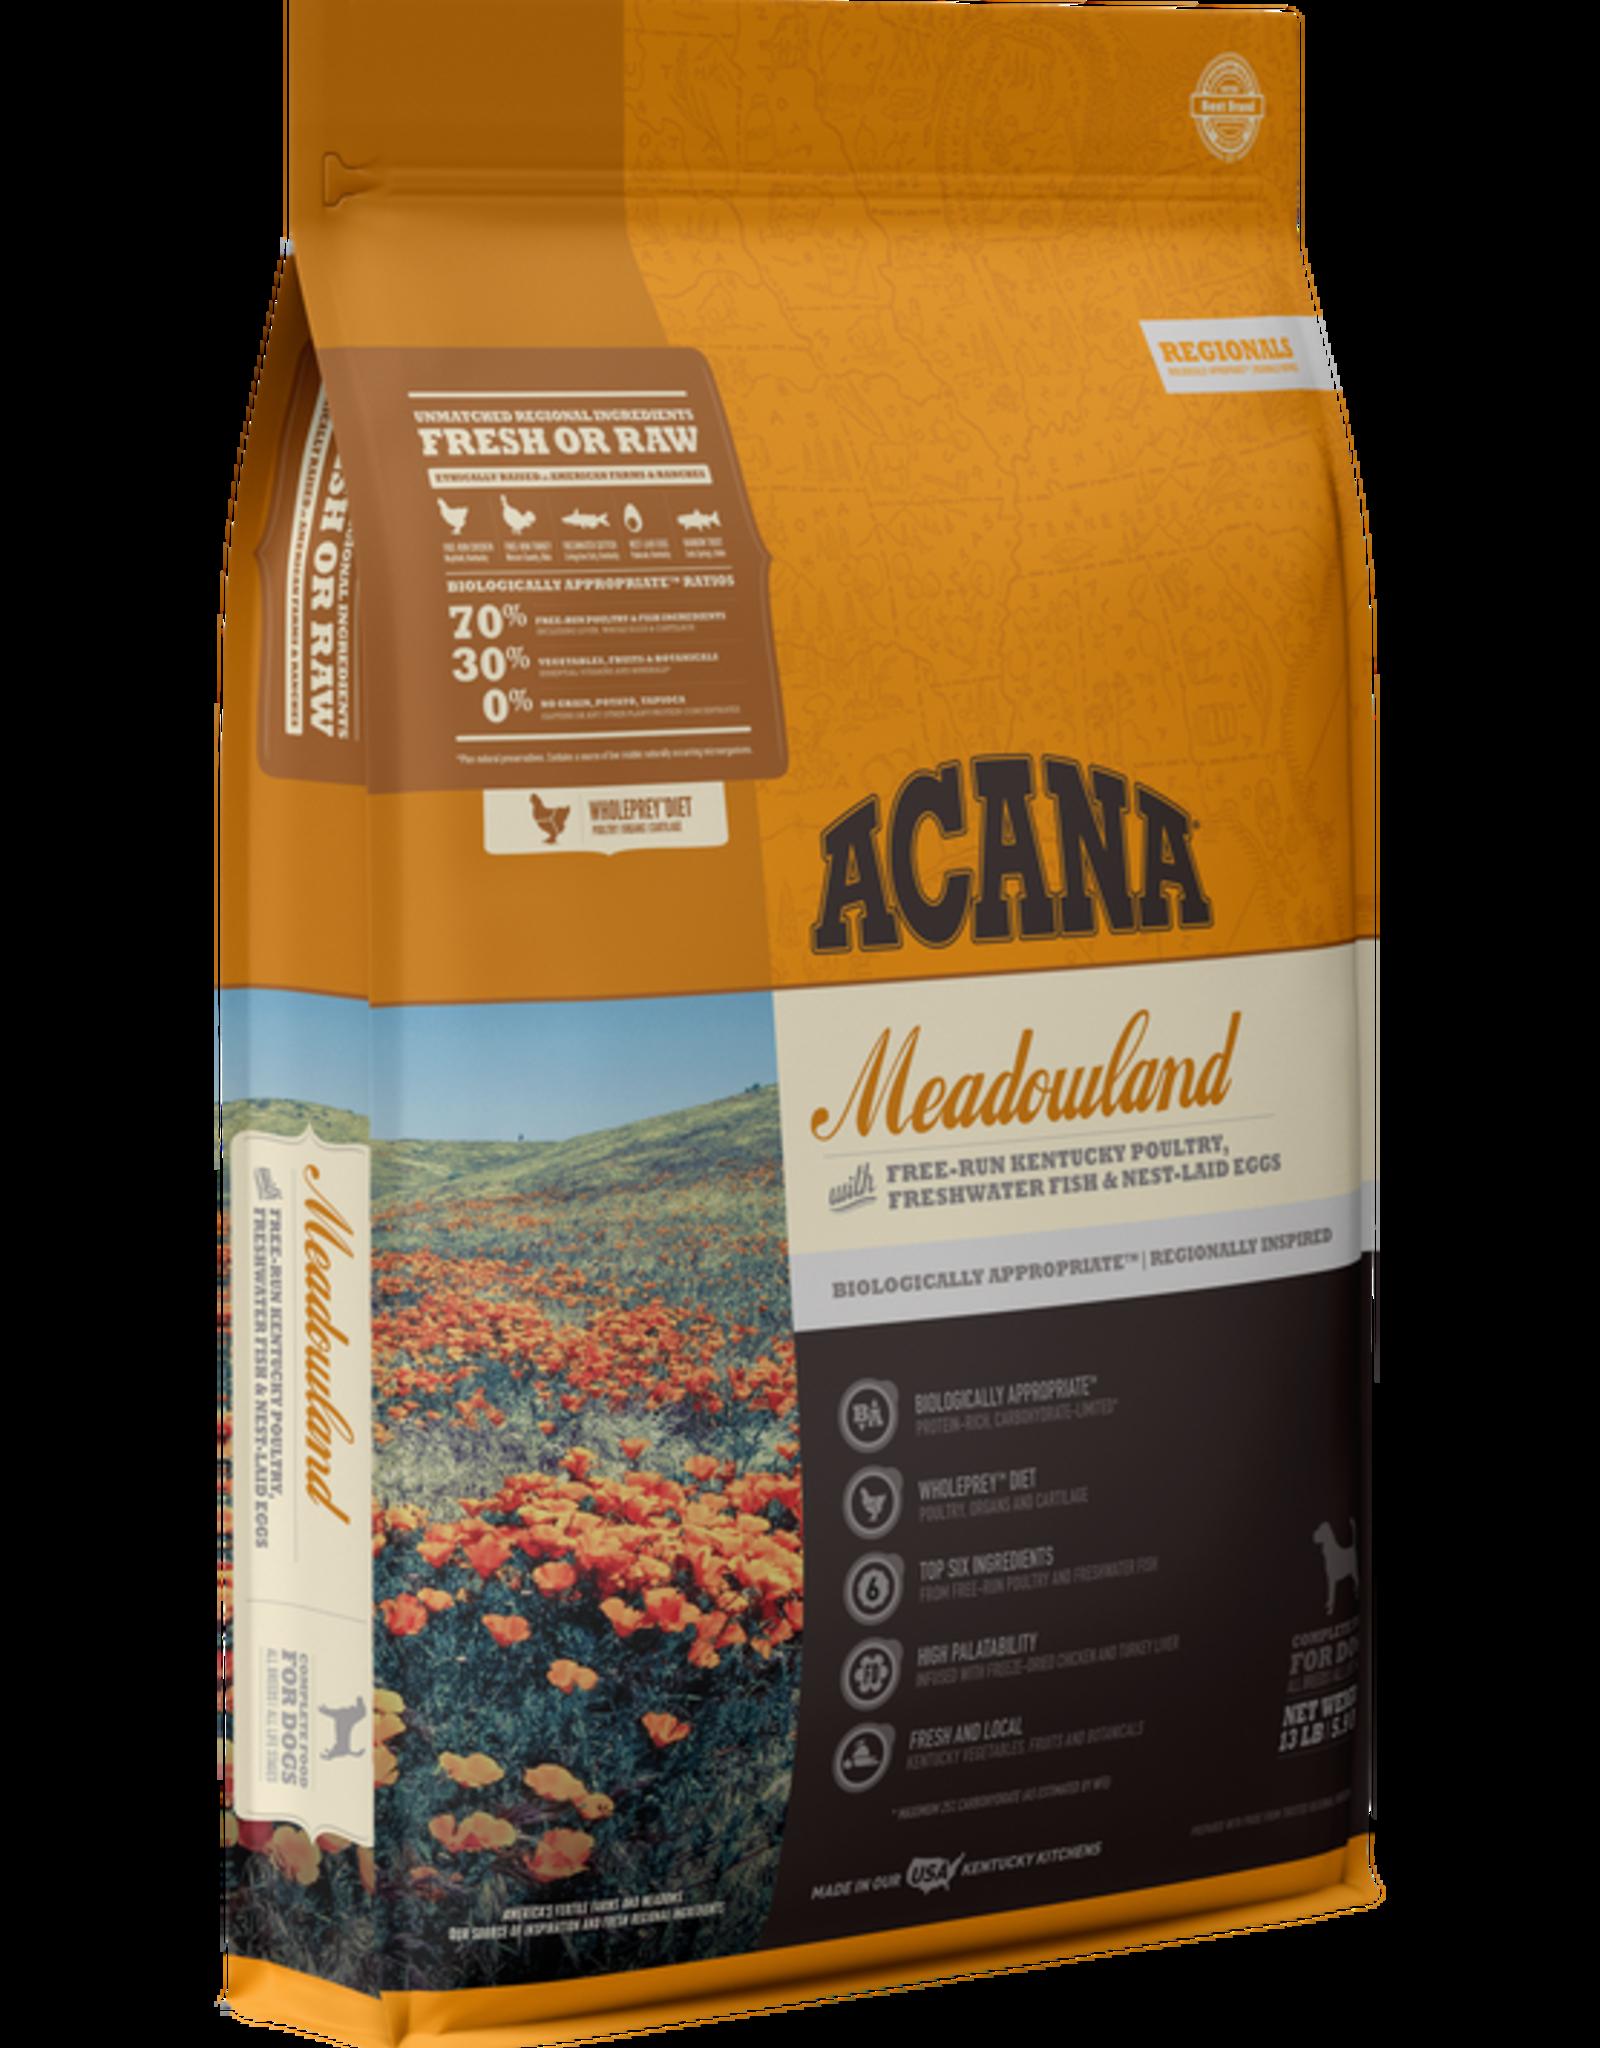 Acana Meadowland 4.5lb